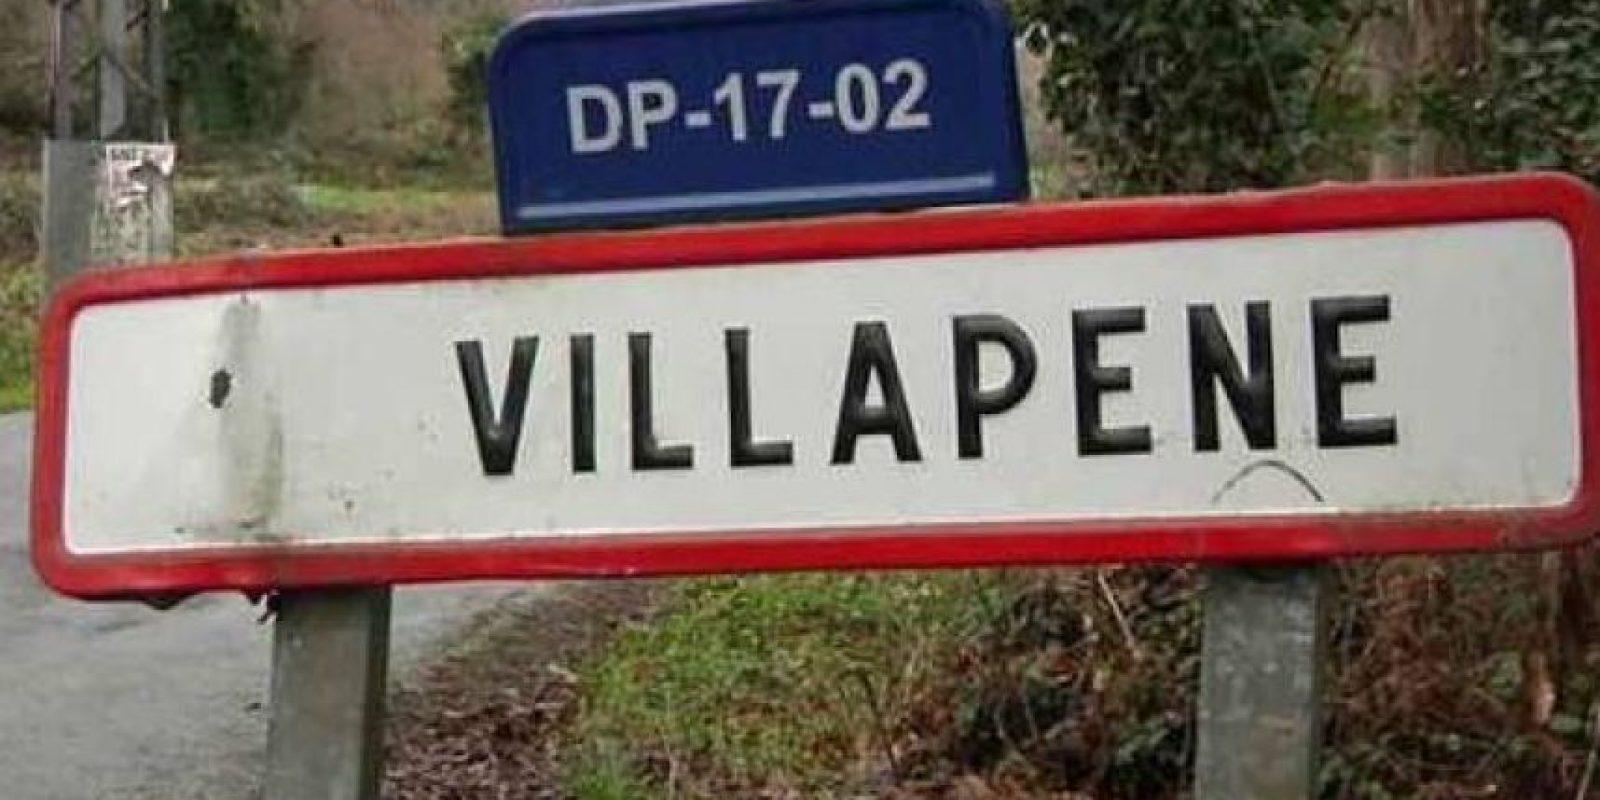 Y el aviso de VillaPene Foto:Wikipedia